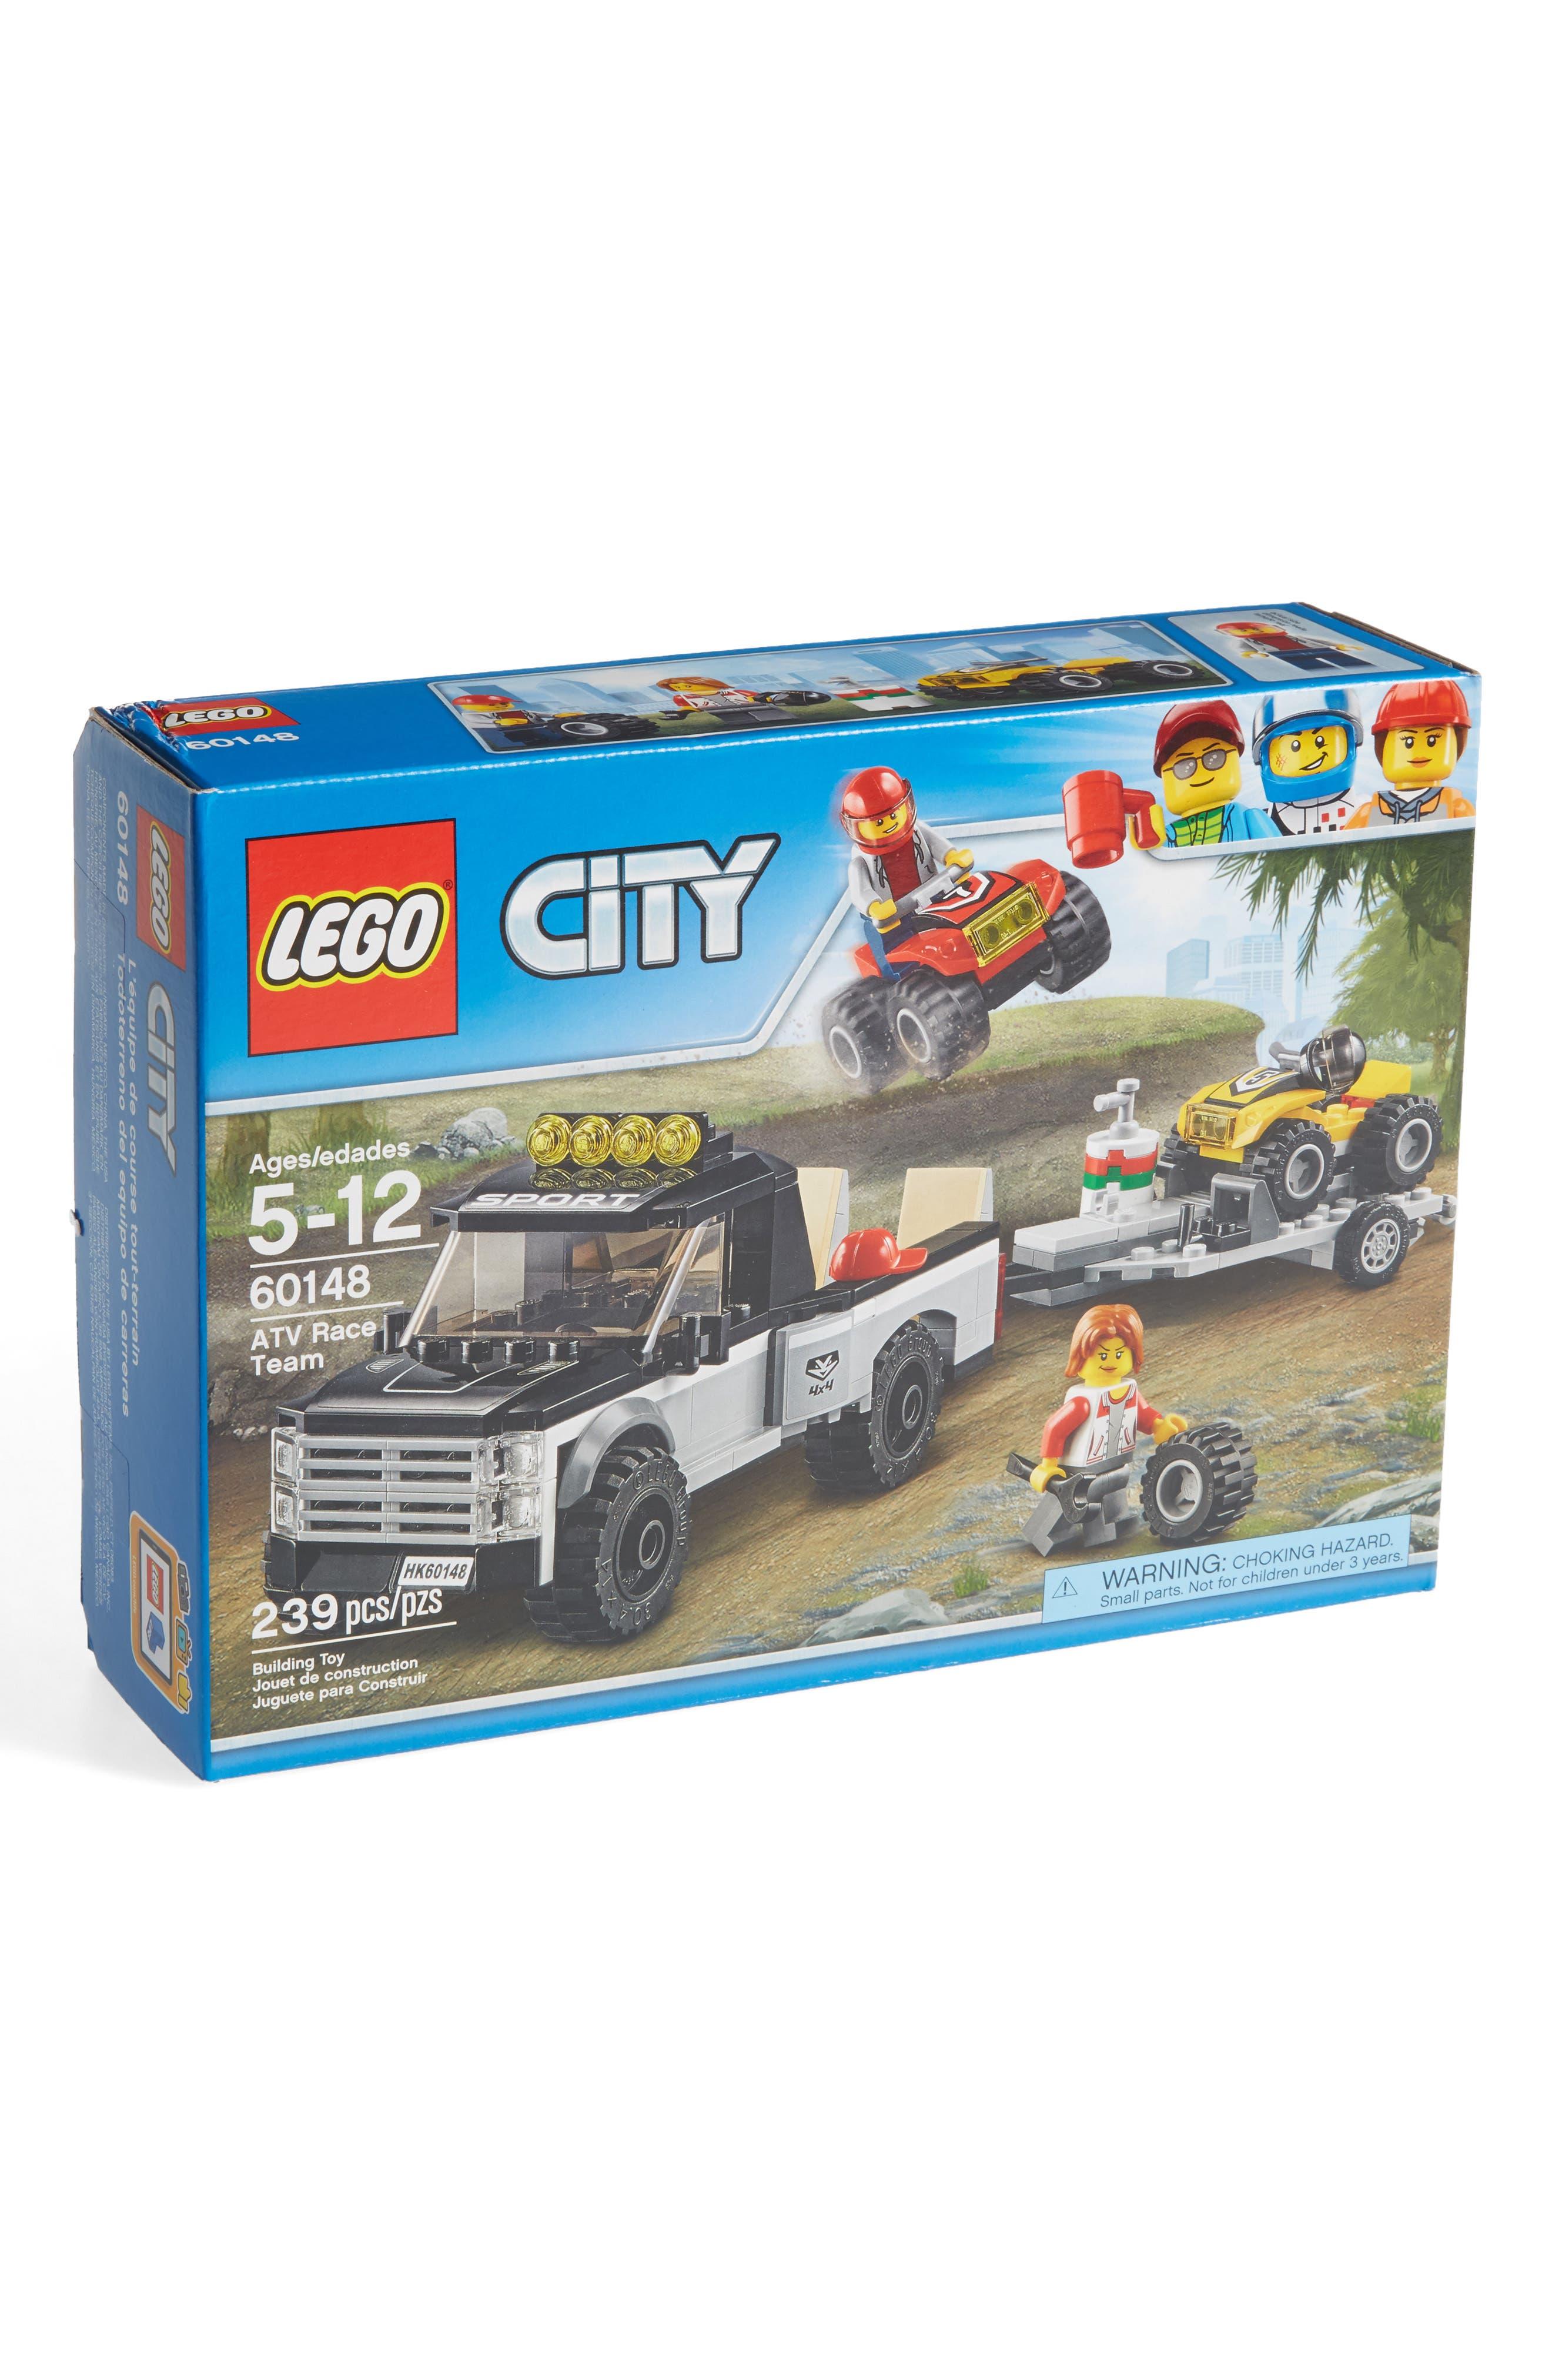 Alternate Image 1 Selected - LEGO® City ATV Race Team - 60148